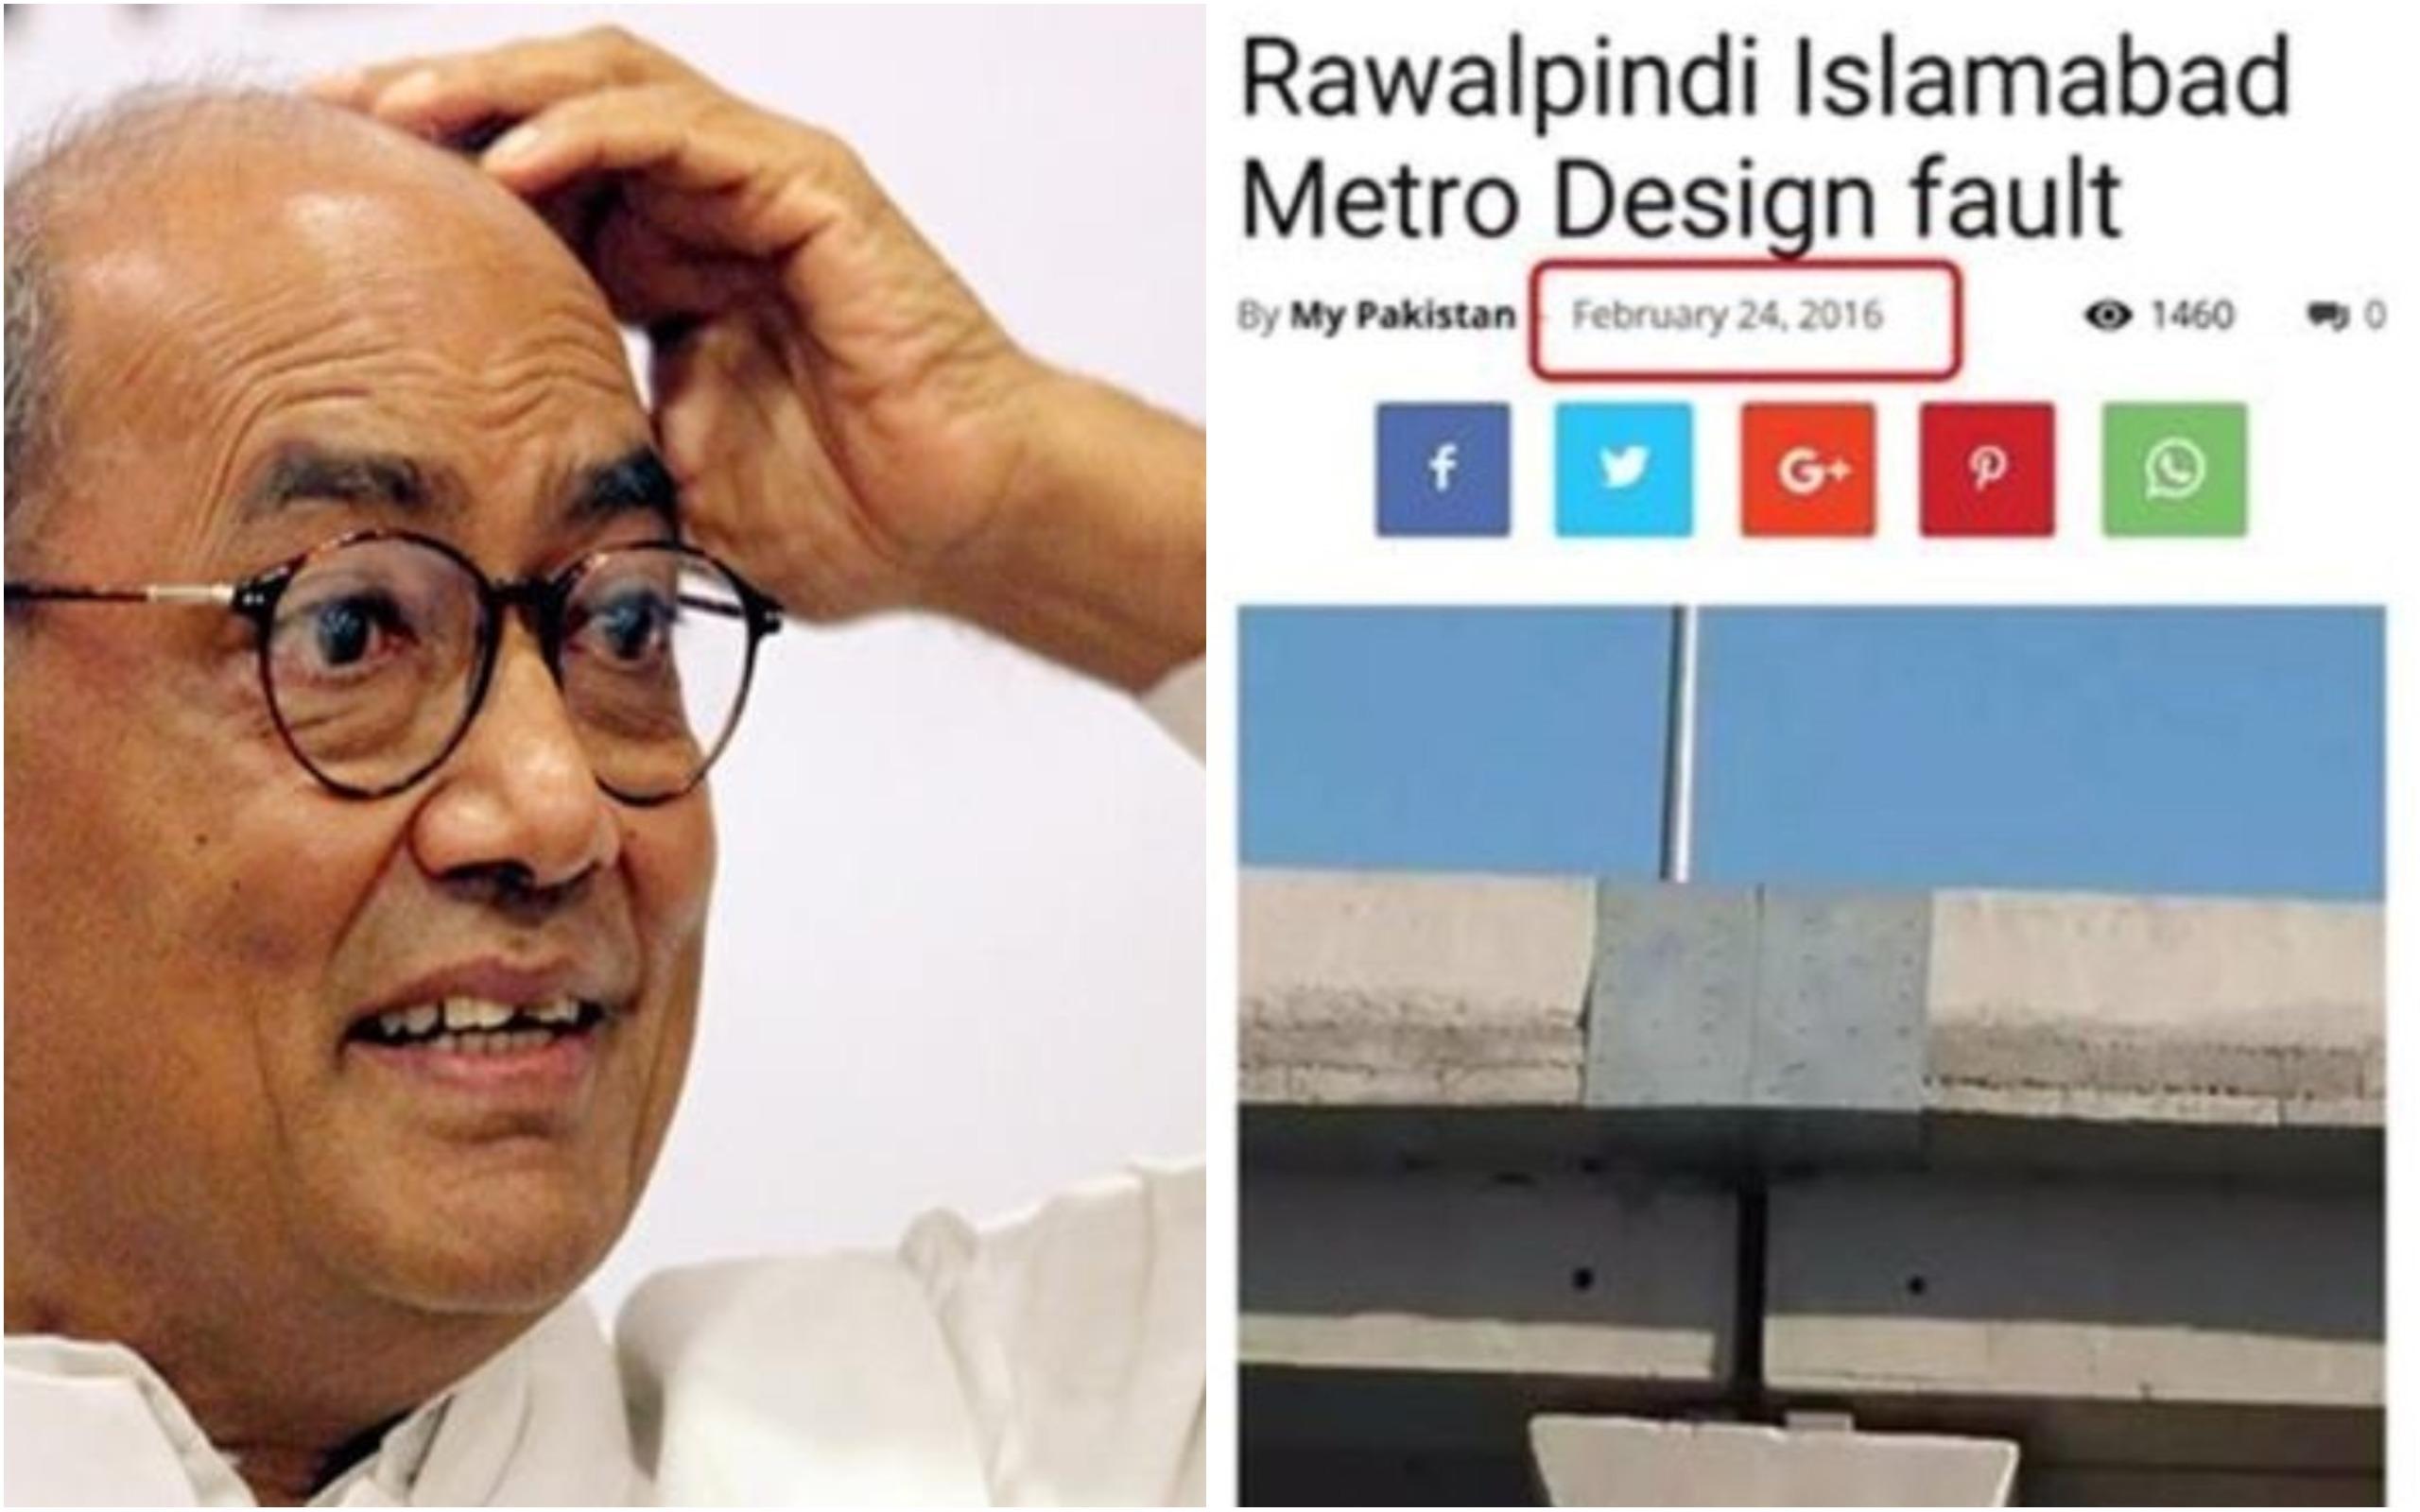 Digvijaya Singh, picture, Rawalpindi, Bhopal, Shivraj Singh Chouhan, NewsMobile, Mobile news, India, Fact Check